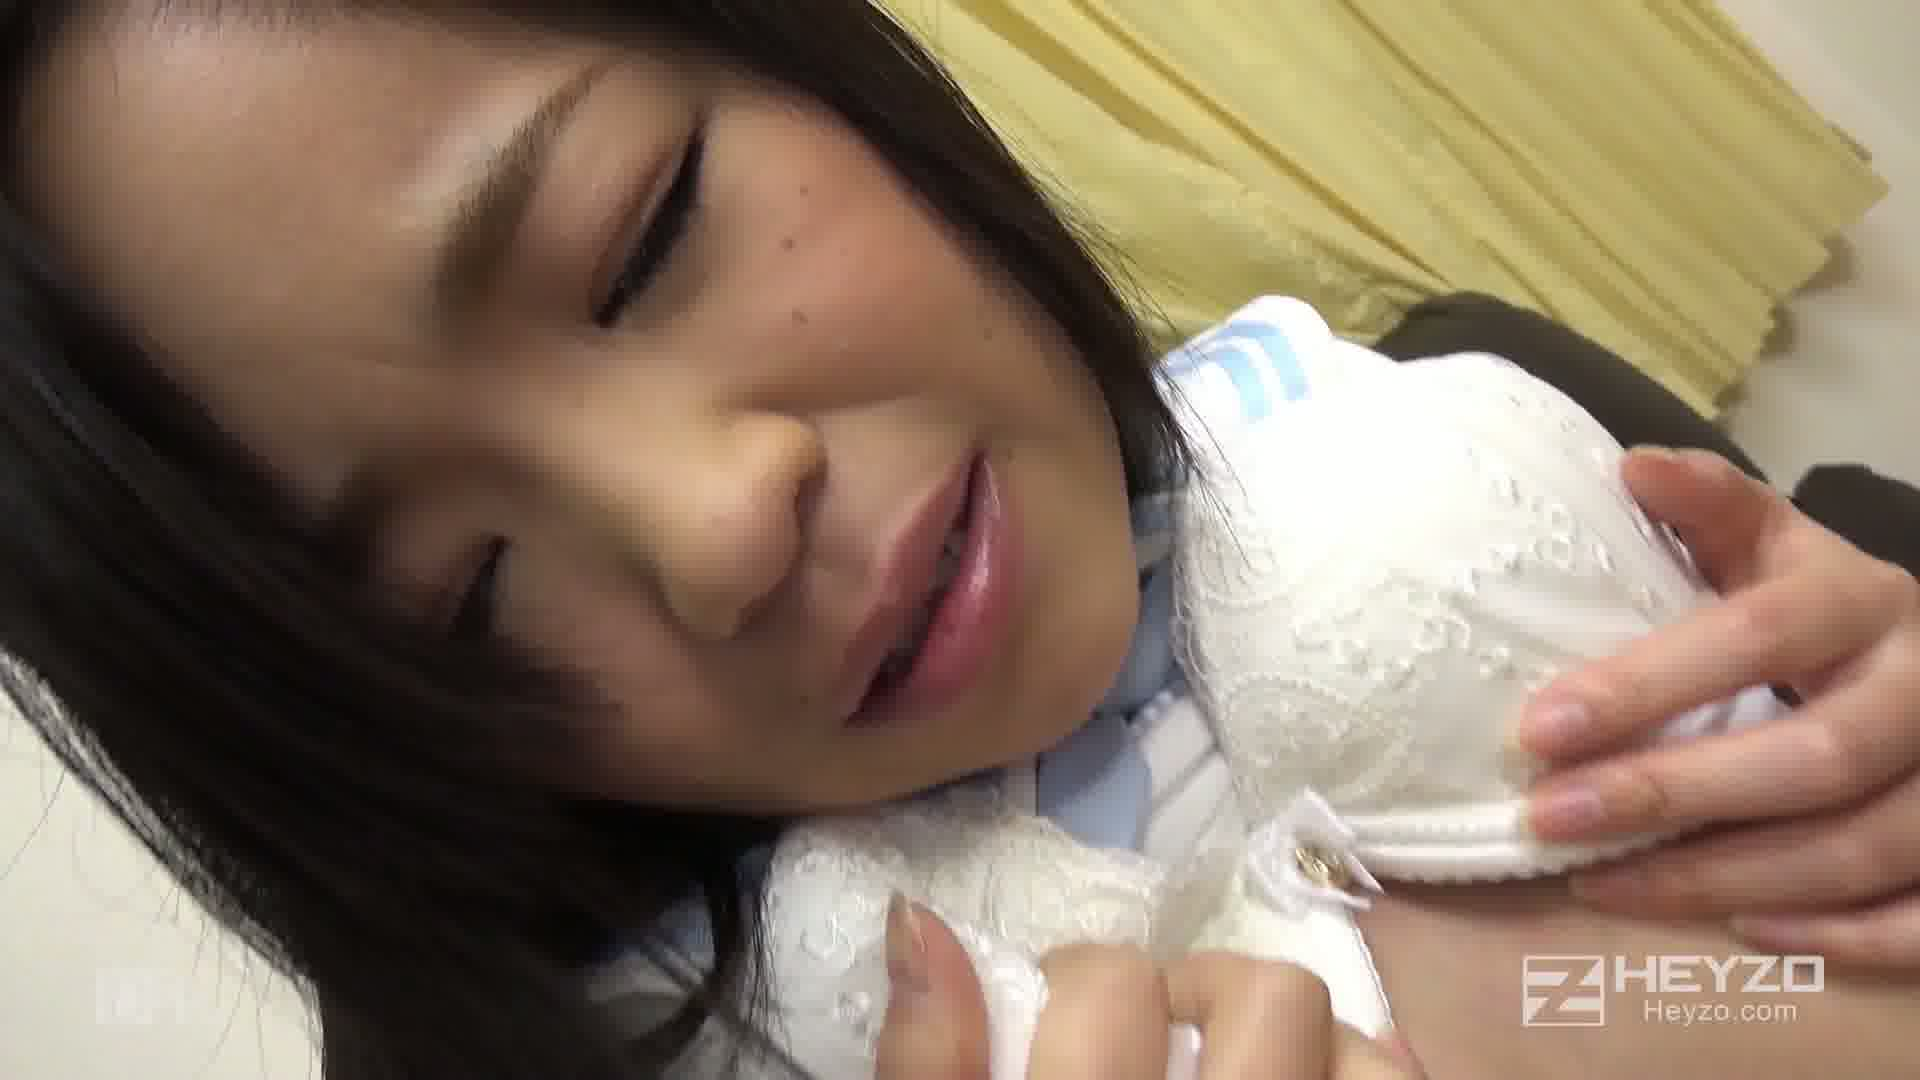 HAMEZO~ハメ撮りコレクション~vol.37 - 水野優奈【ソファー ローター オナニー】